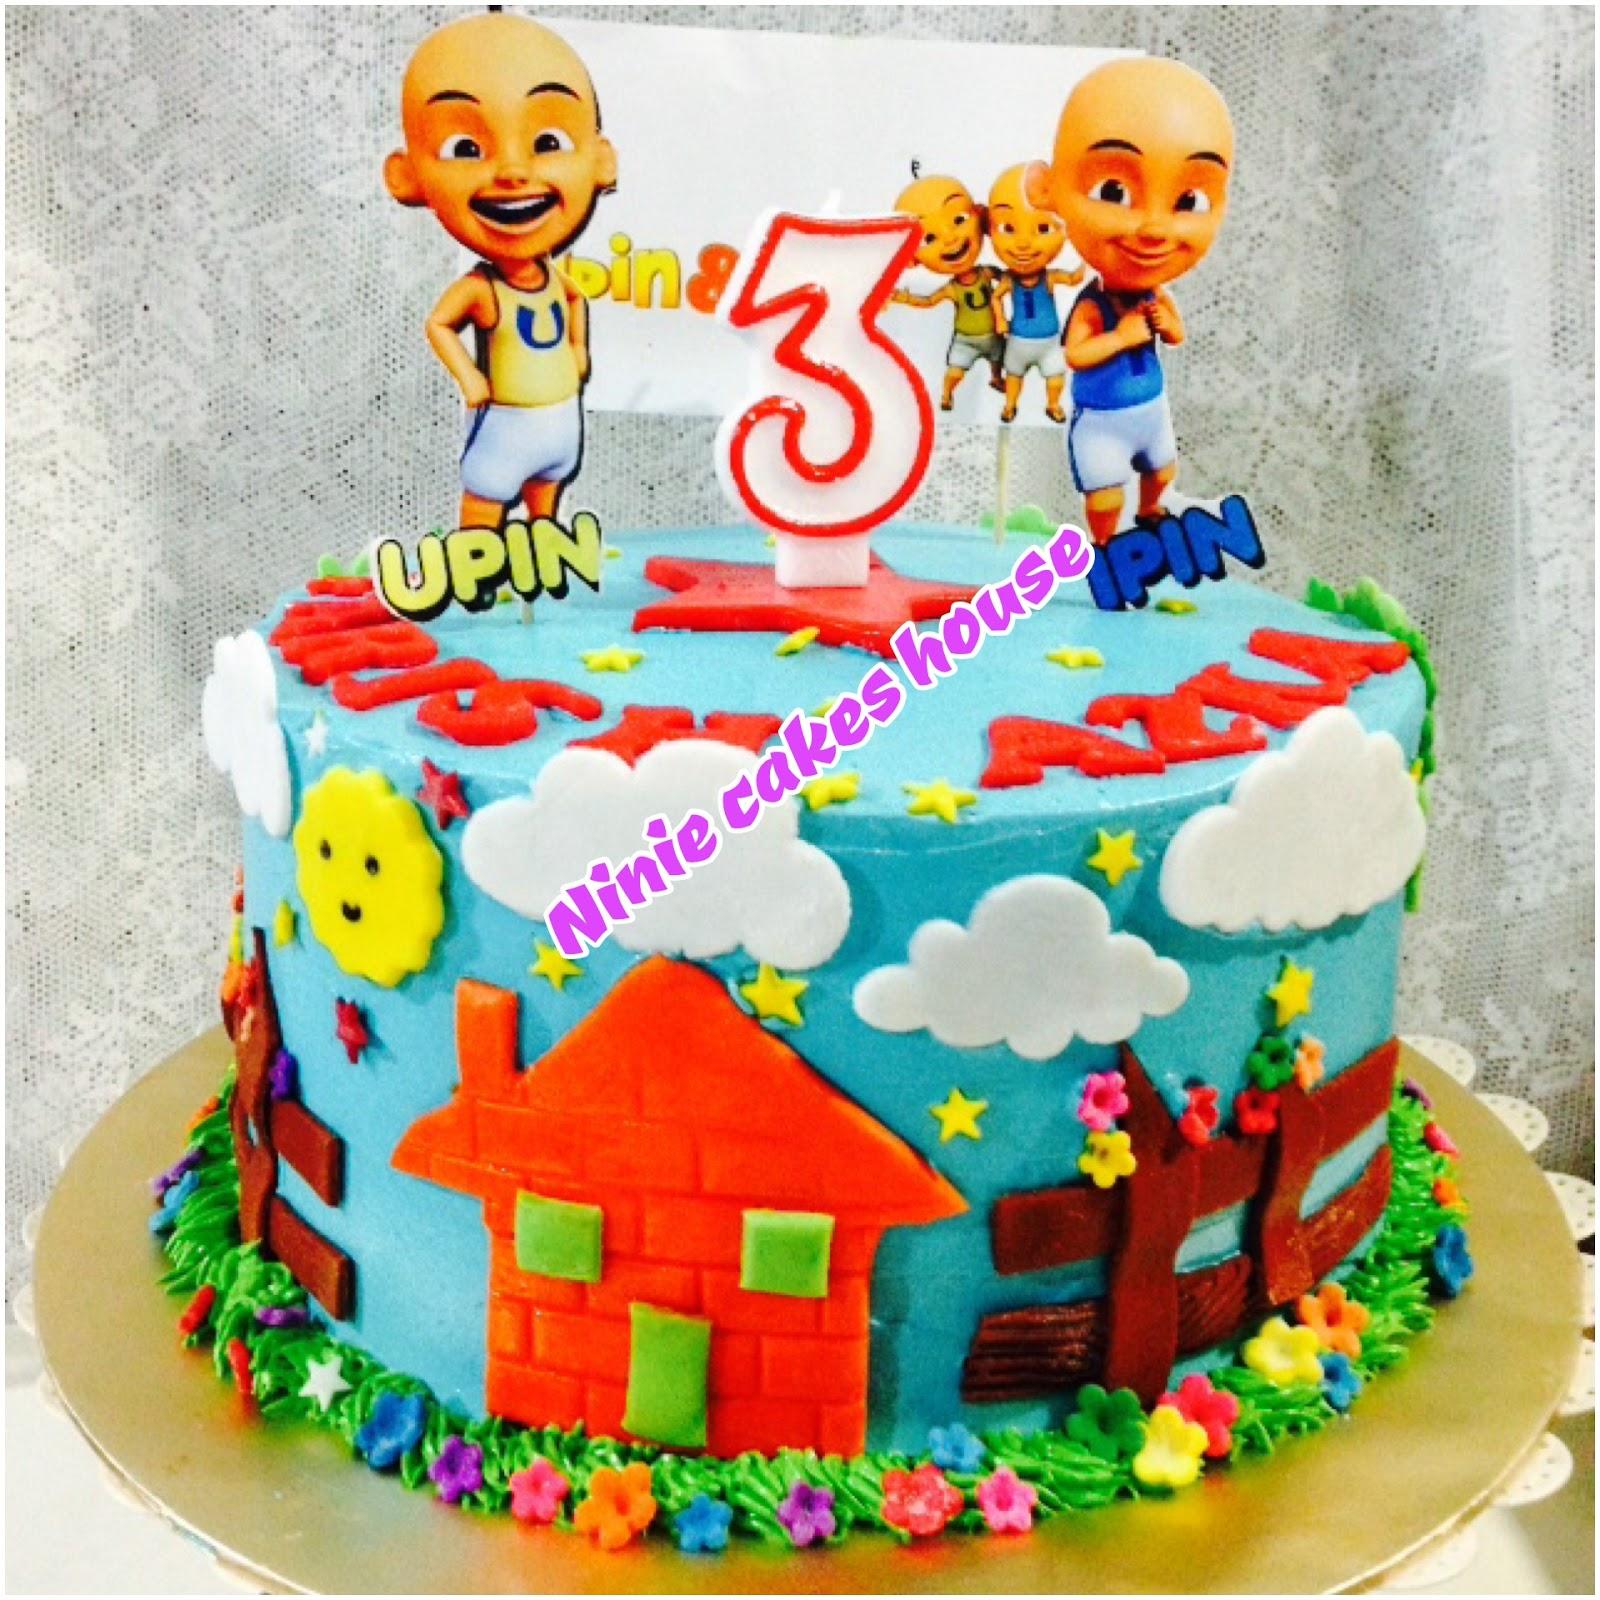 Ninie Cakes House: Upin & Ipin Birthday Cake